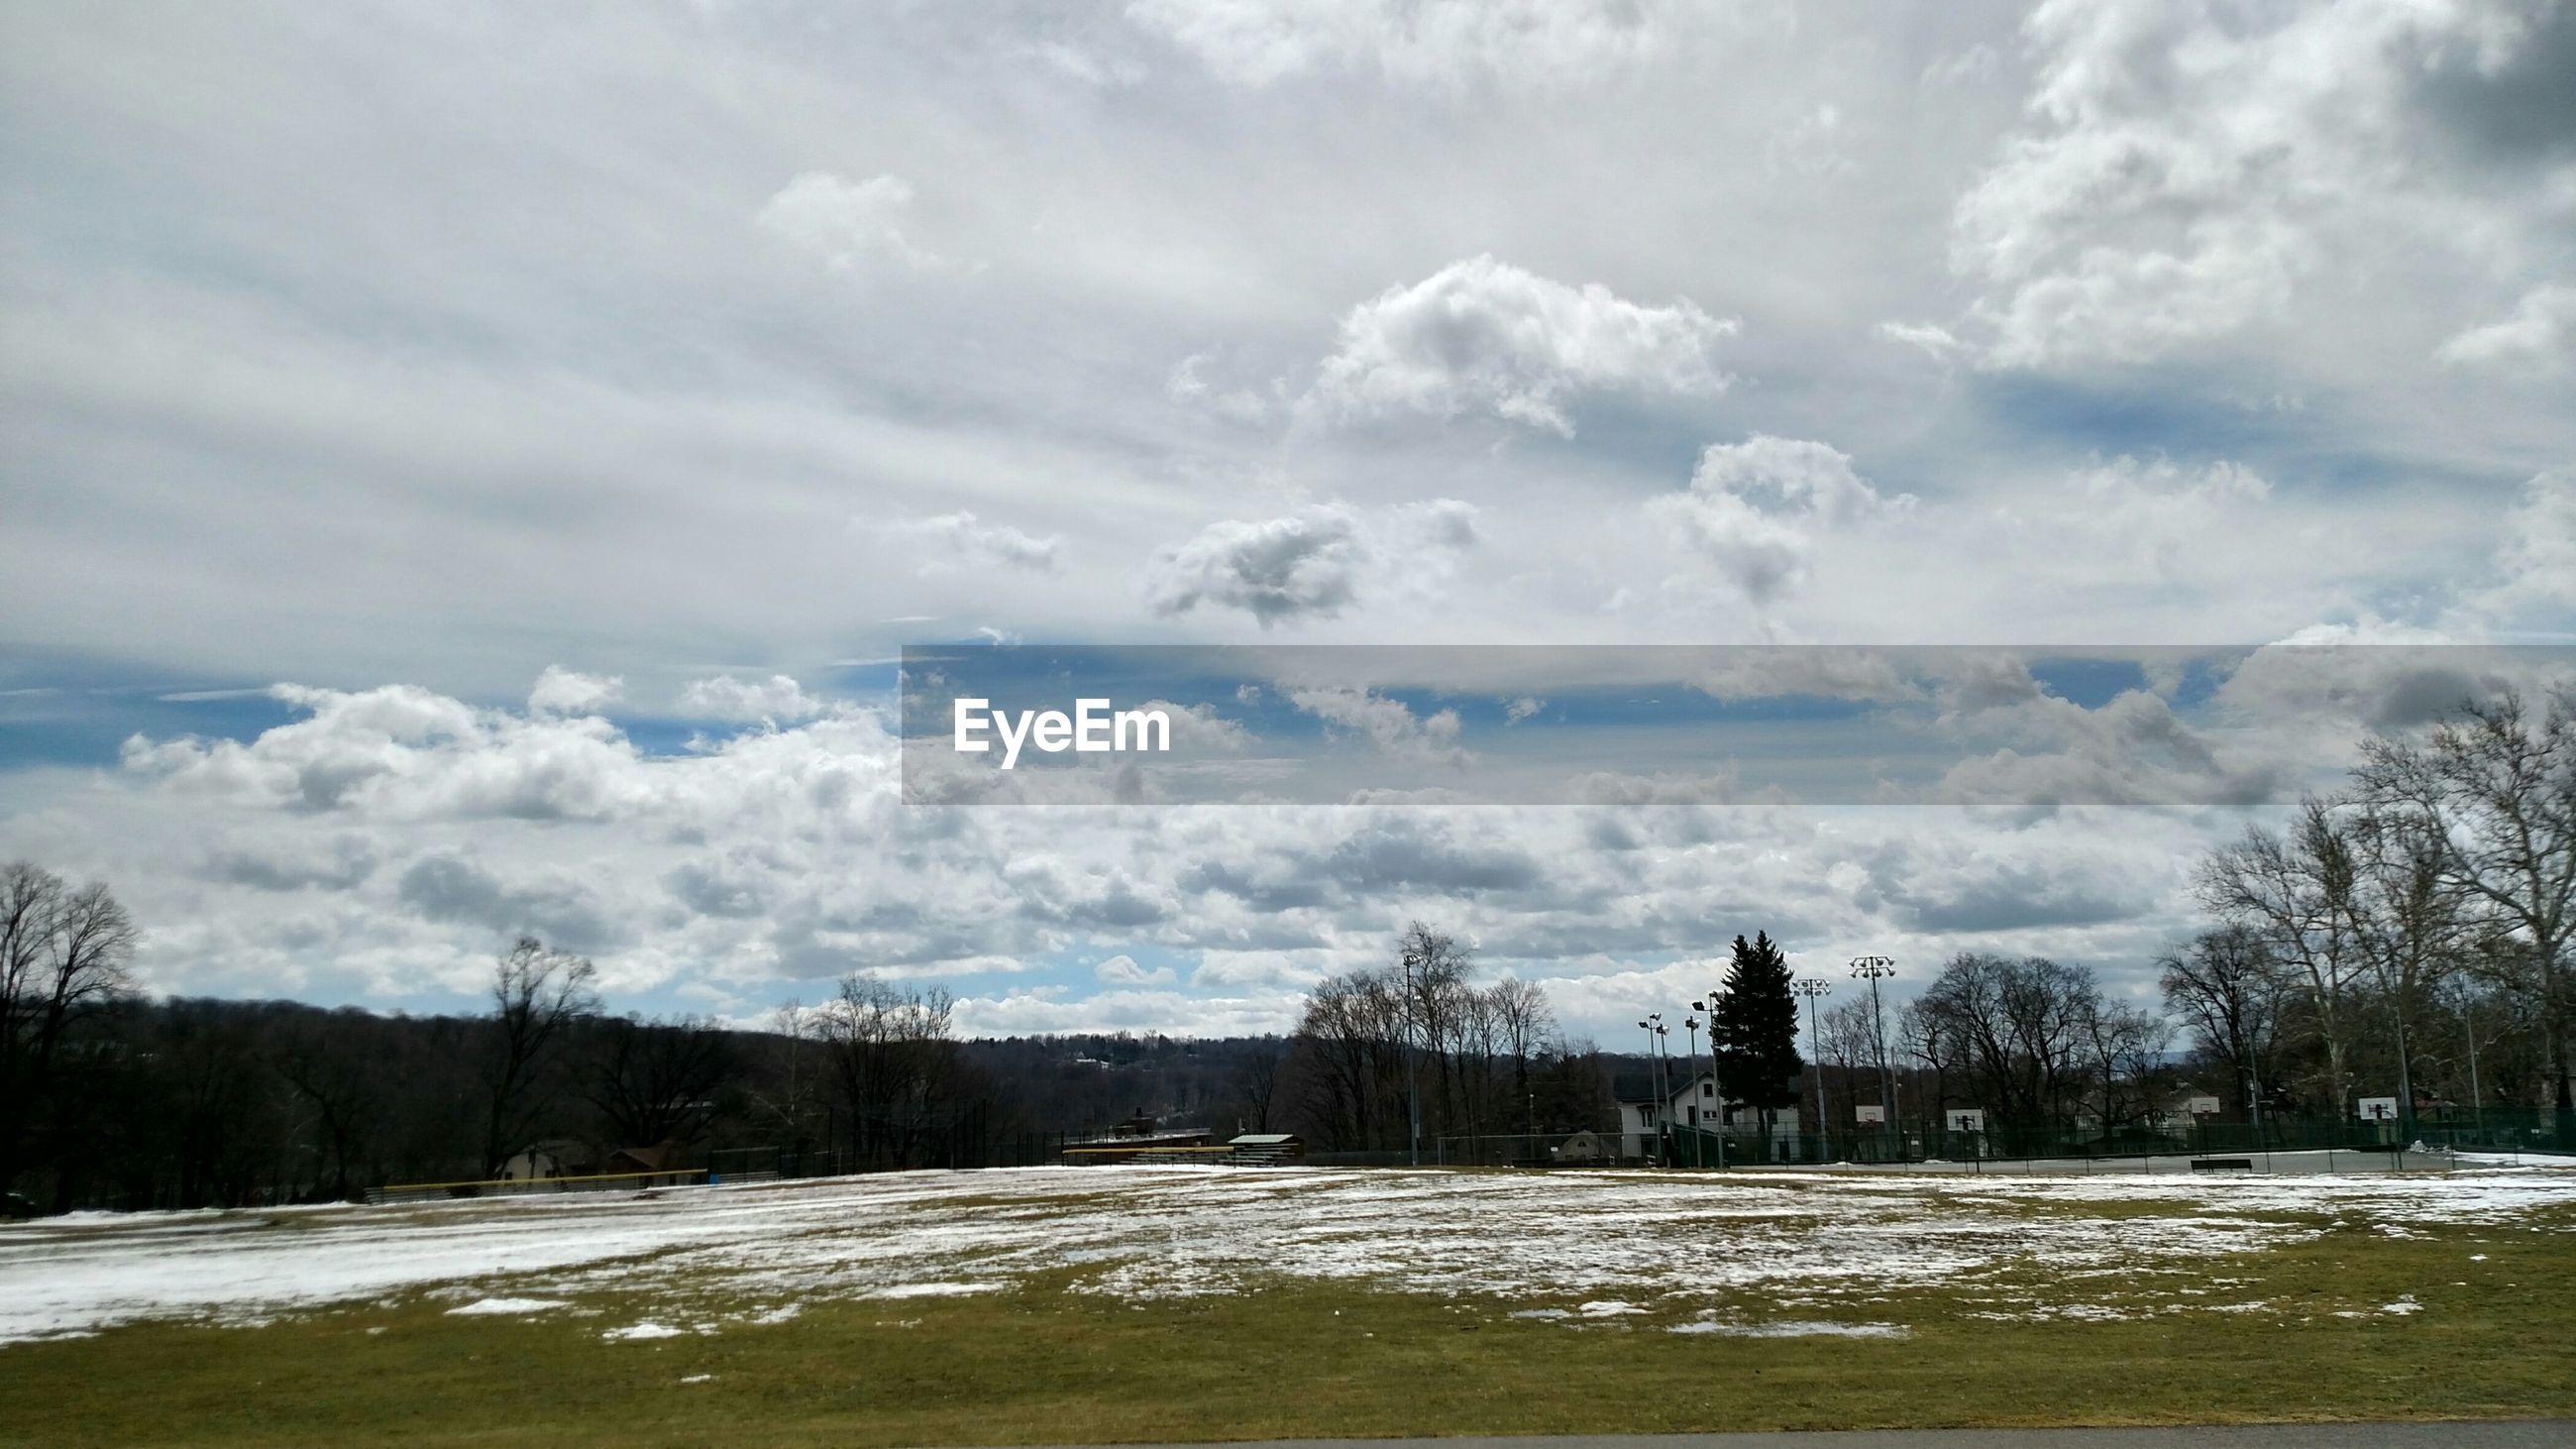 Snowy landscape against cloudy sky